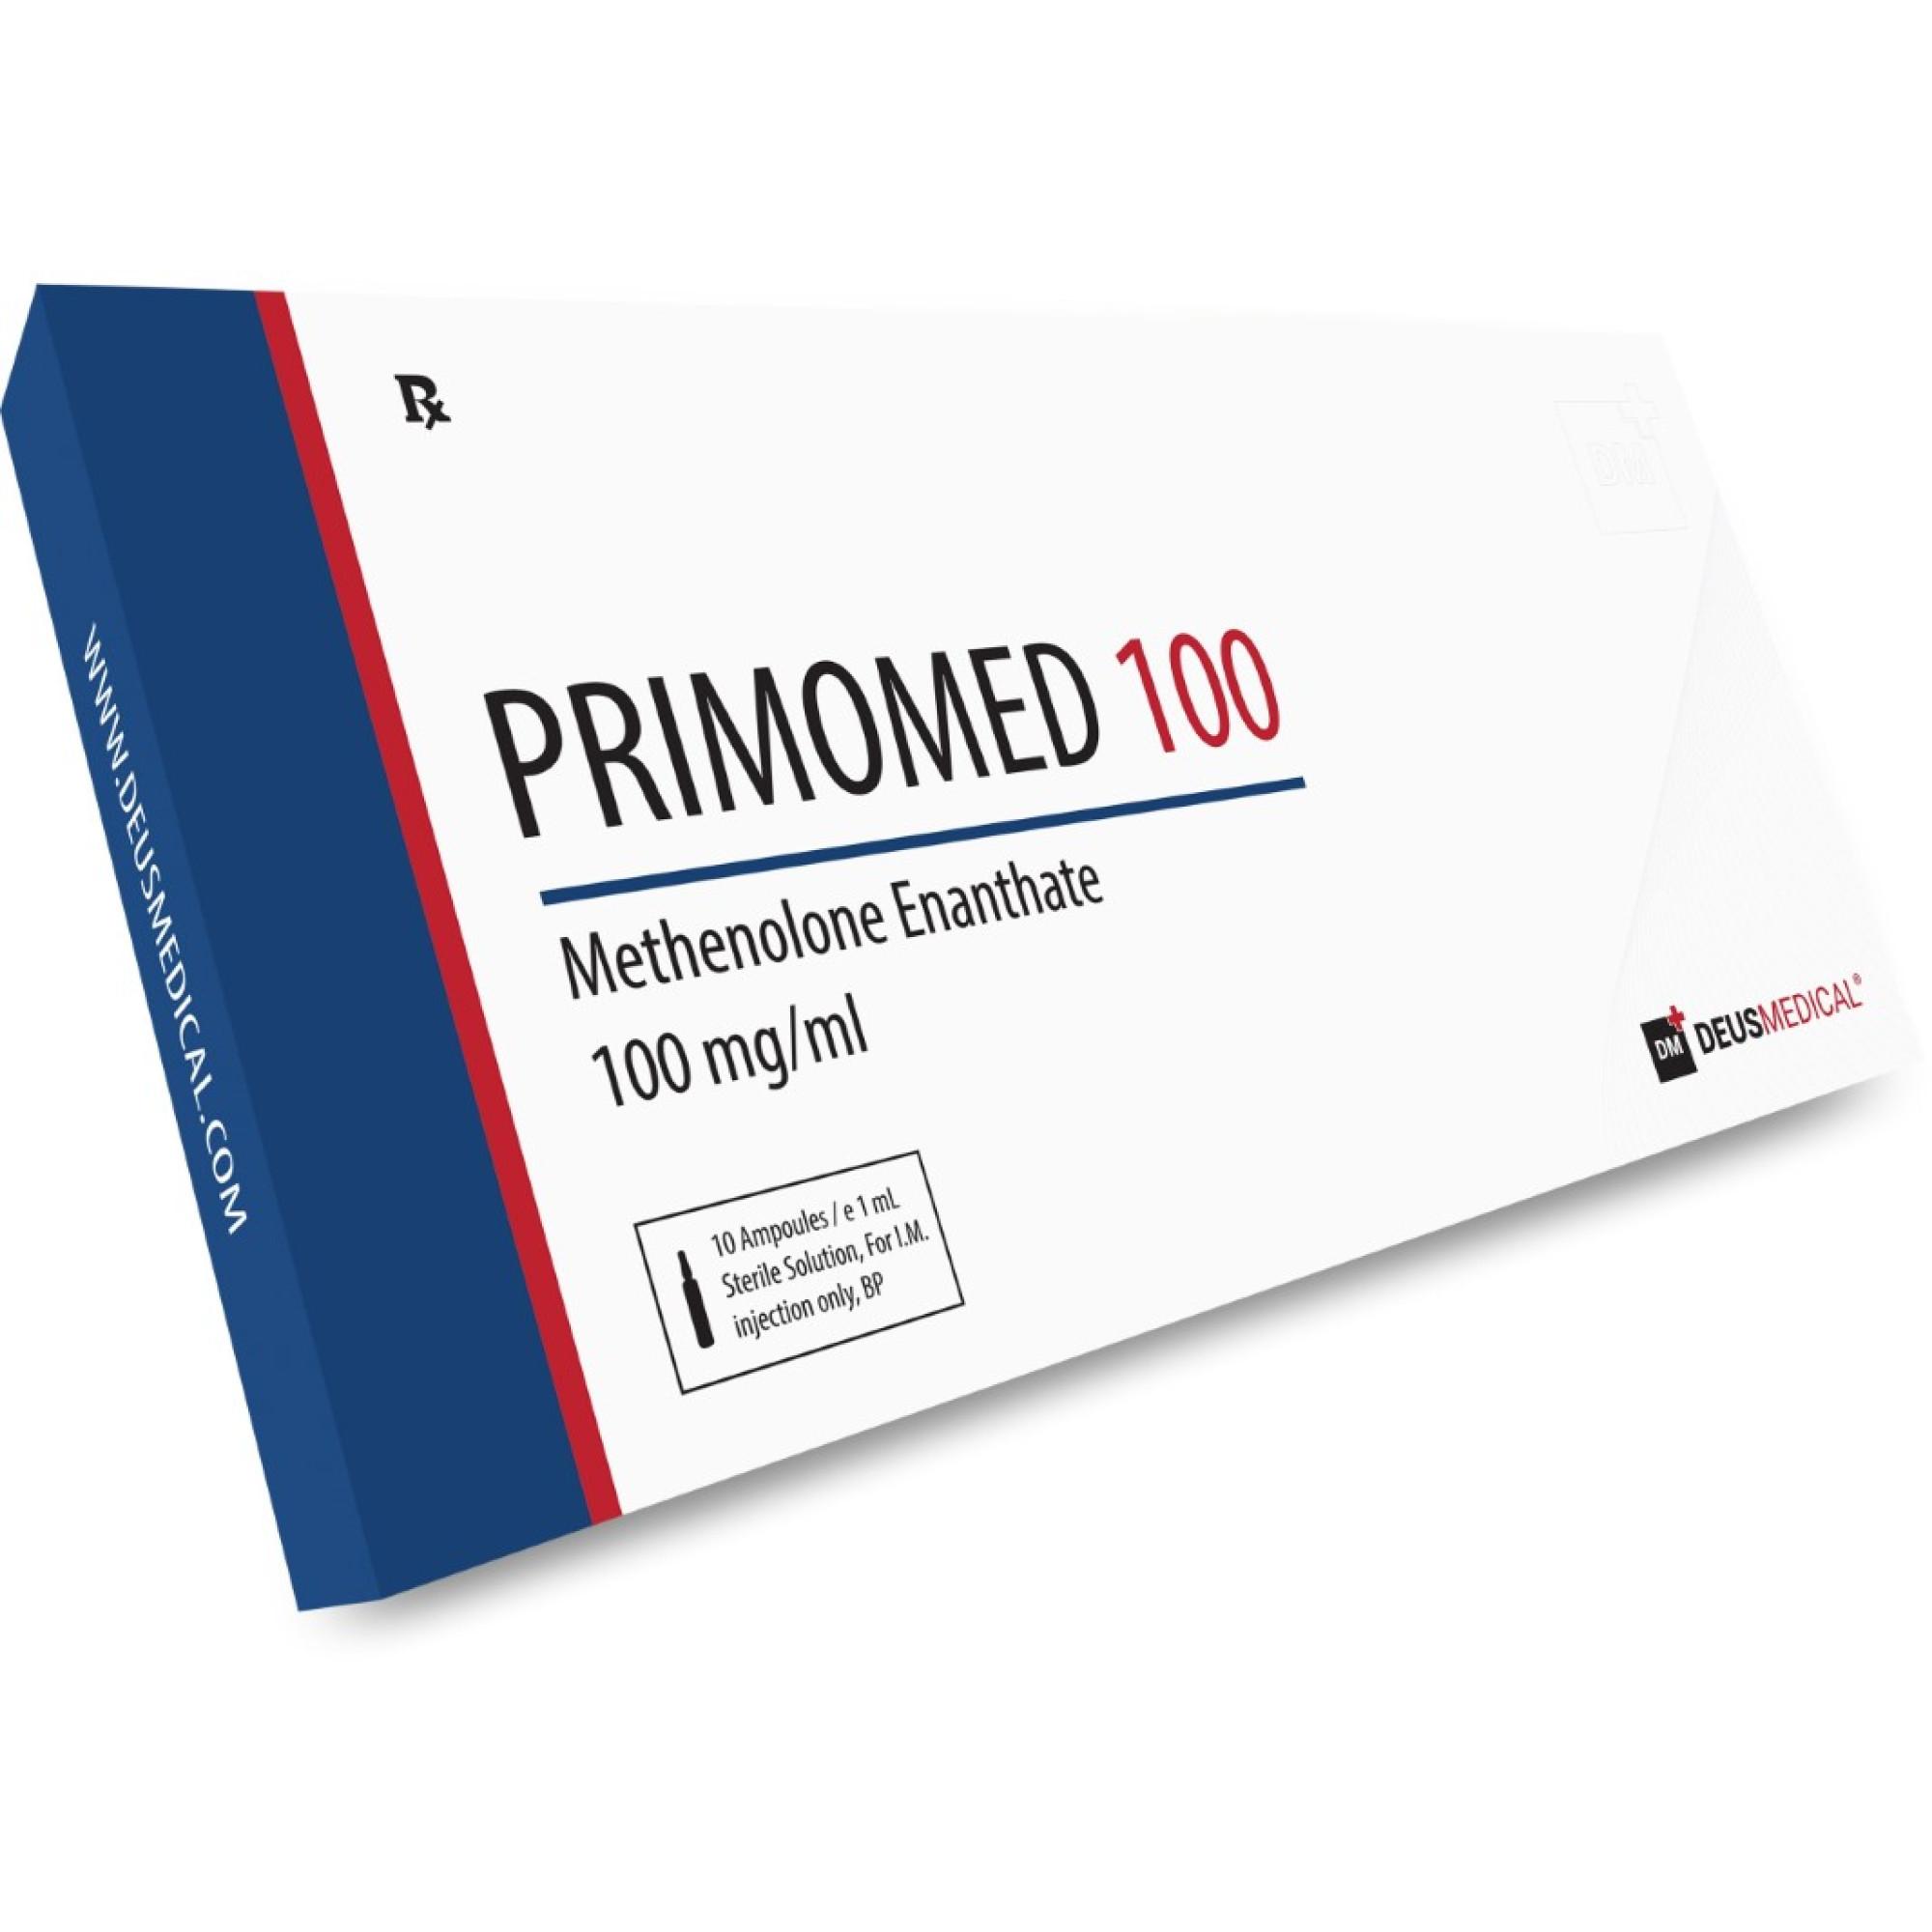 PRIMOMED 100 (Methenolone Enanthate), DEUS MEDICAL, BUY STEROIDS ONLINE - www.DEUSPOWER.com